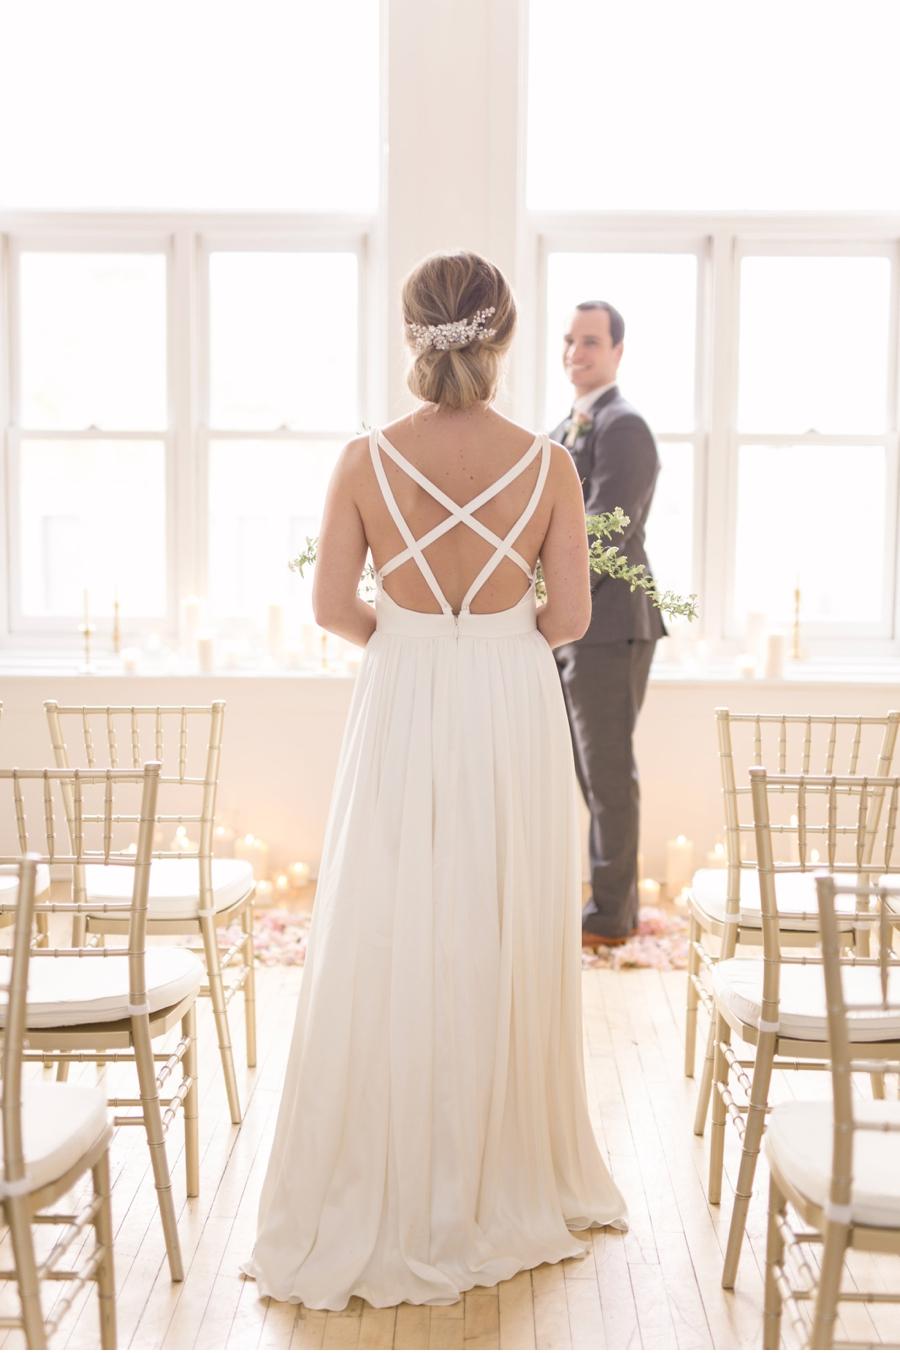 Manitoba-Wedding-Blog-Post